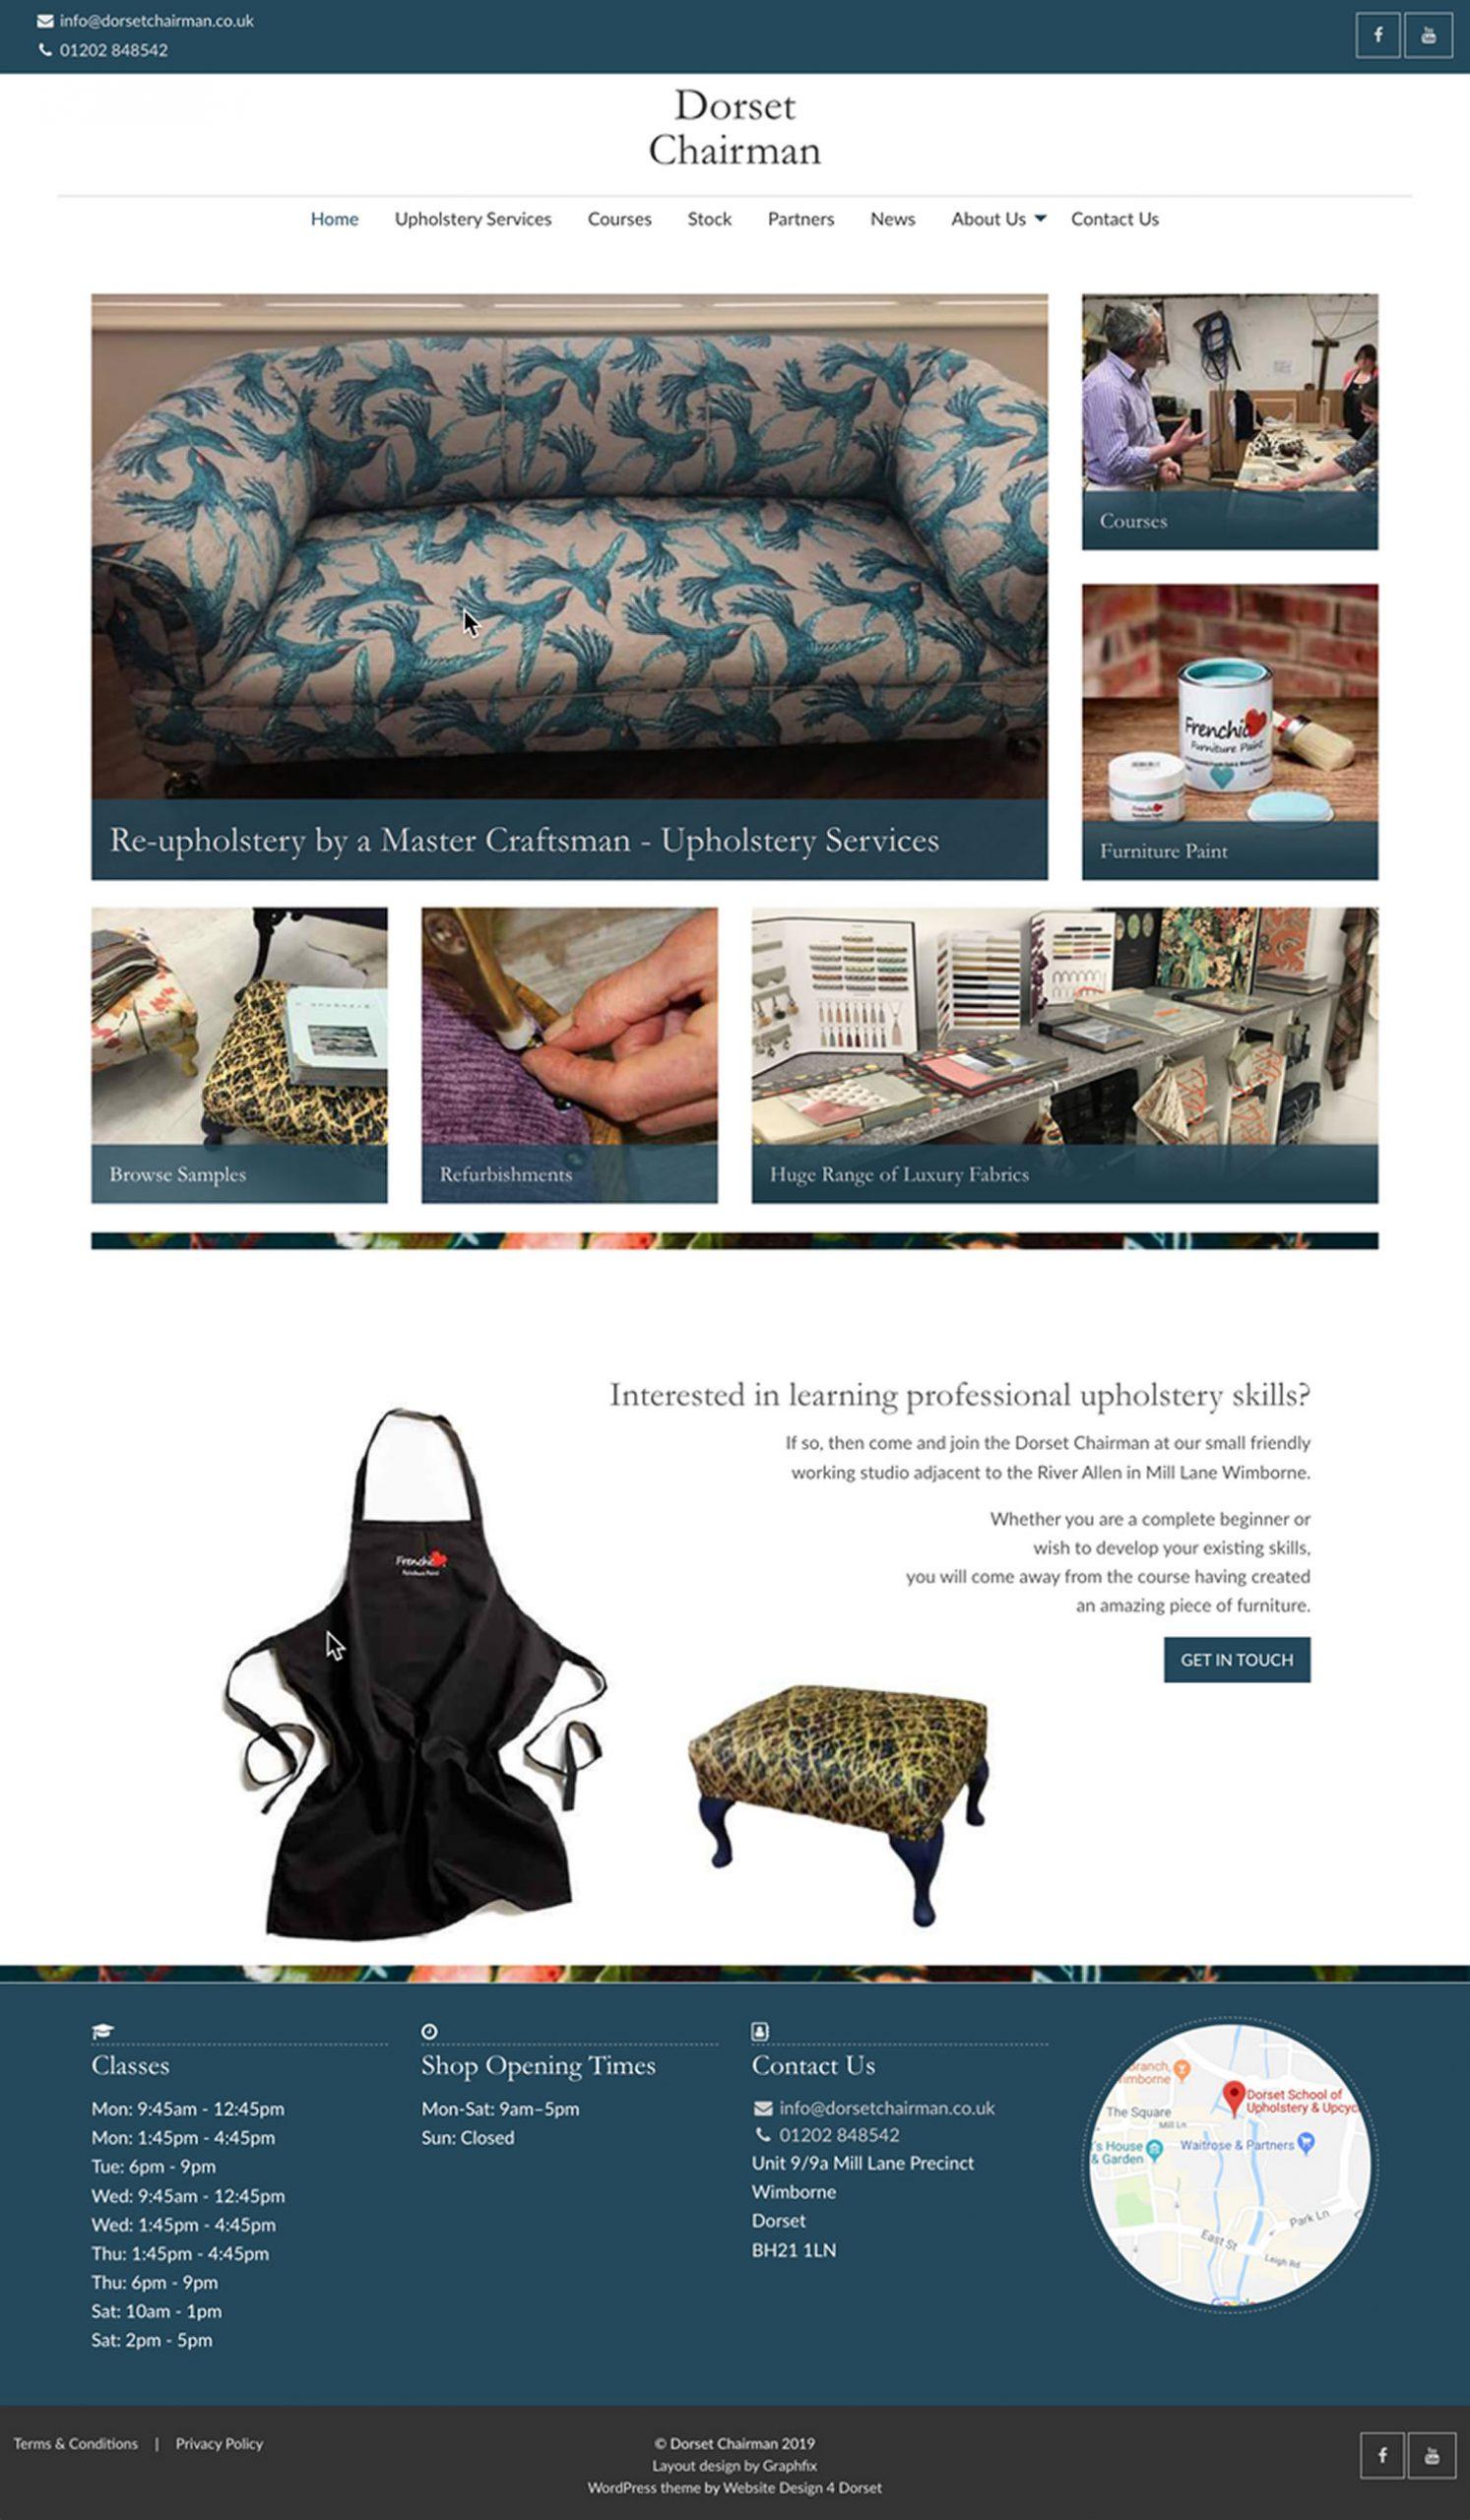 Dorset Chairman website layout design